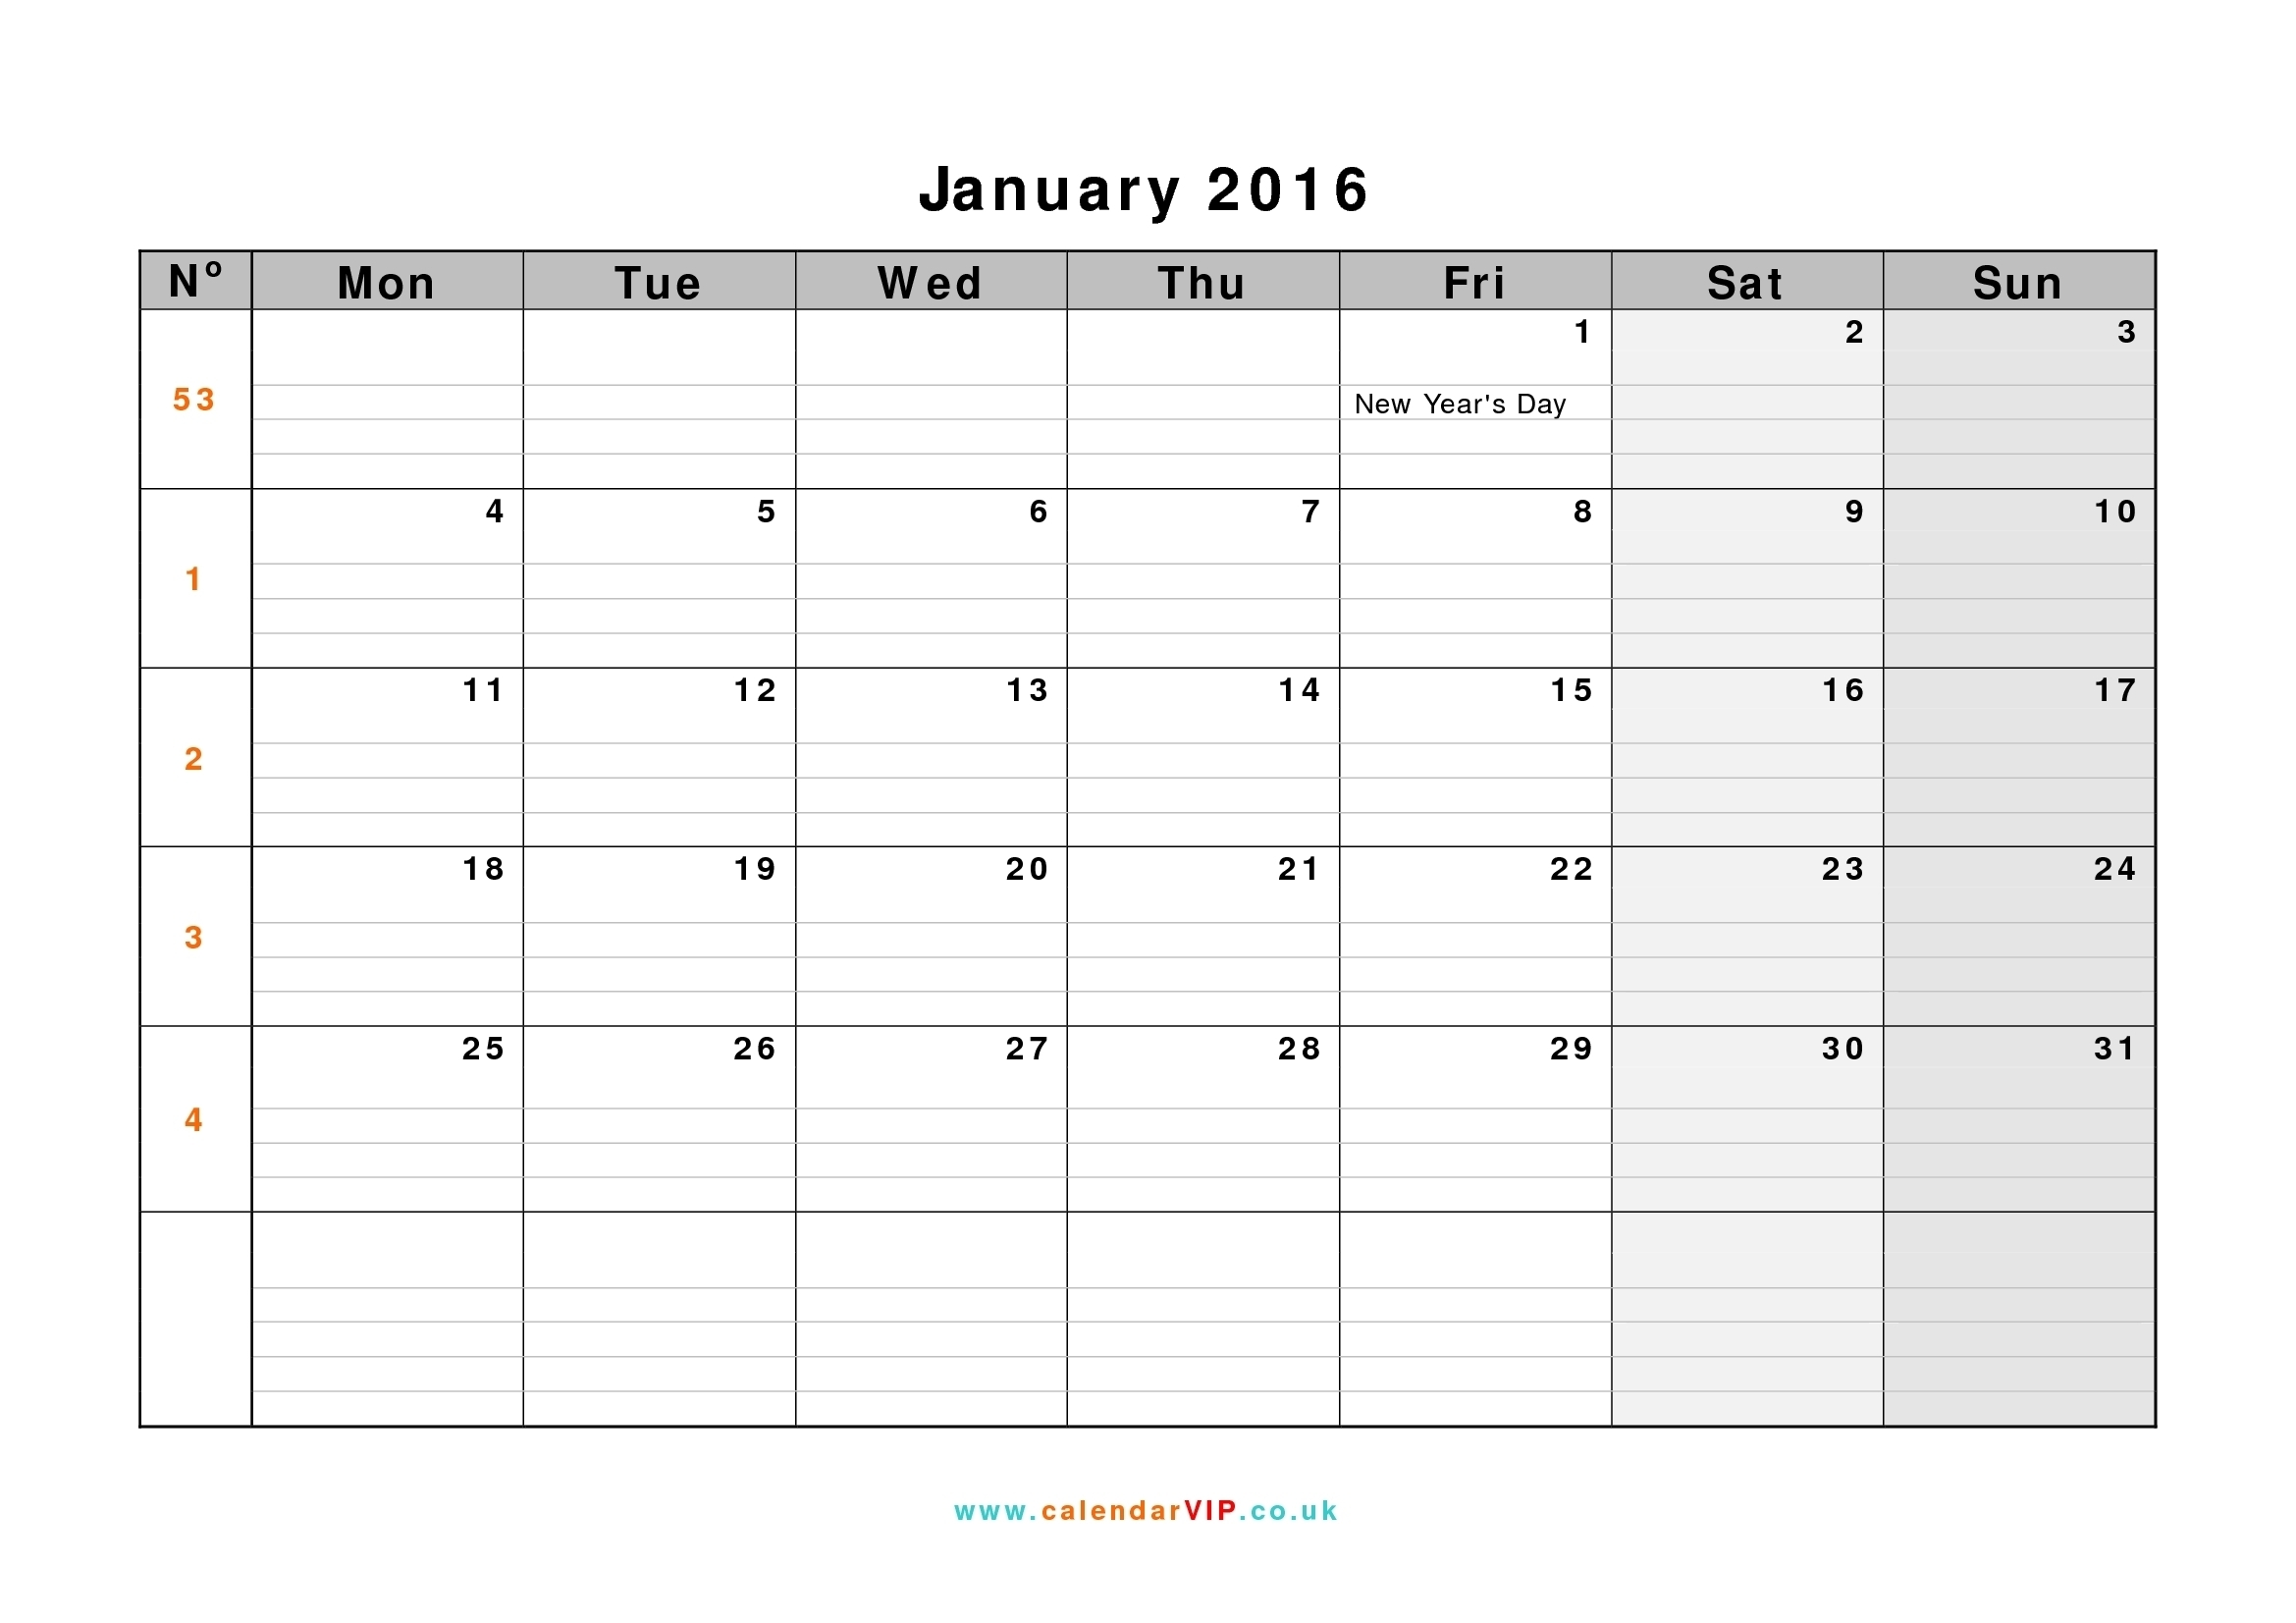 Week Calendar Monday To Sunday | Ten Free Printable Calendar 2020-2021